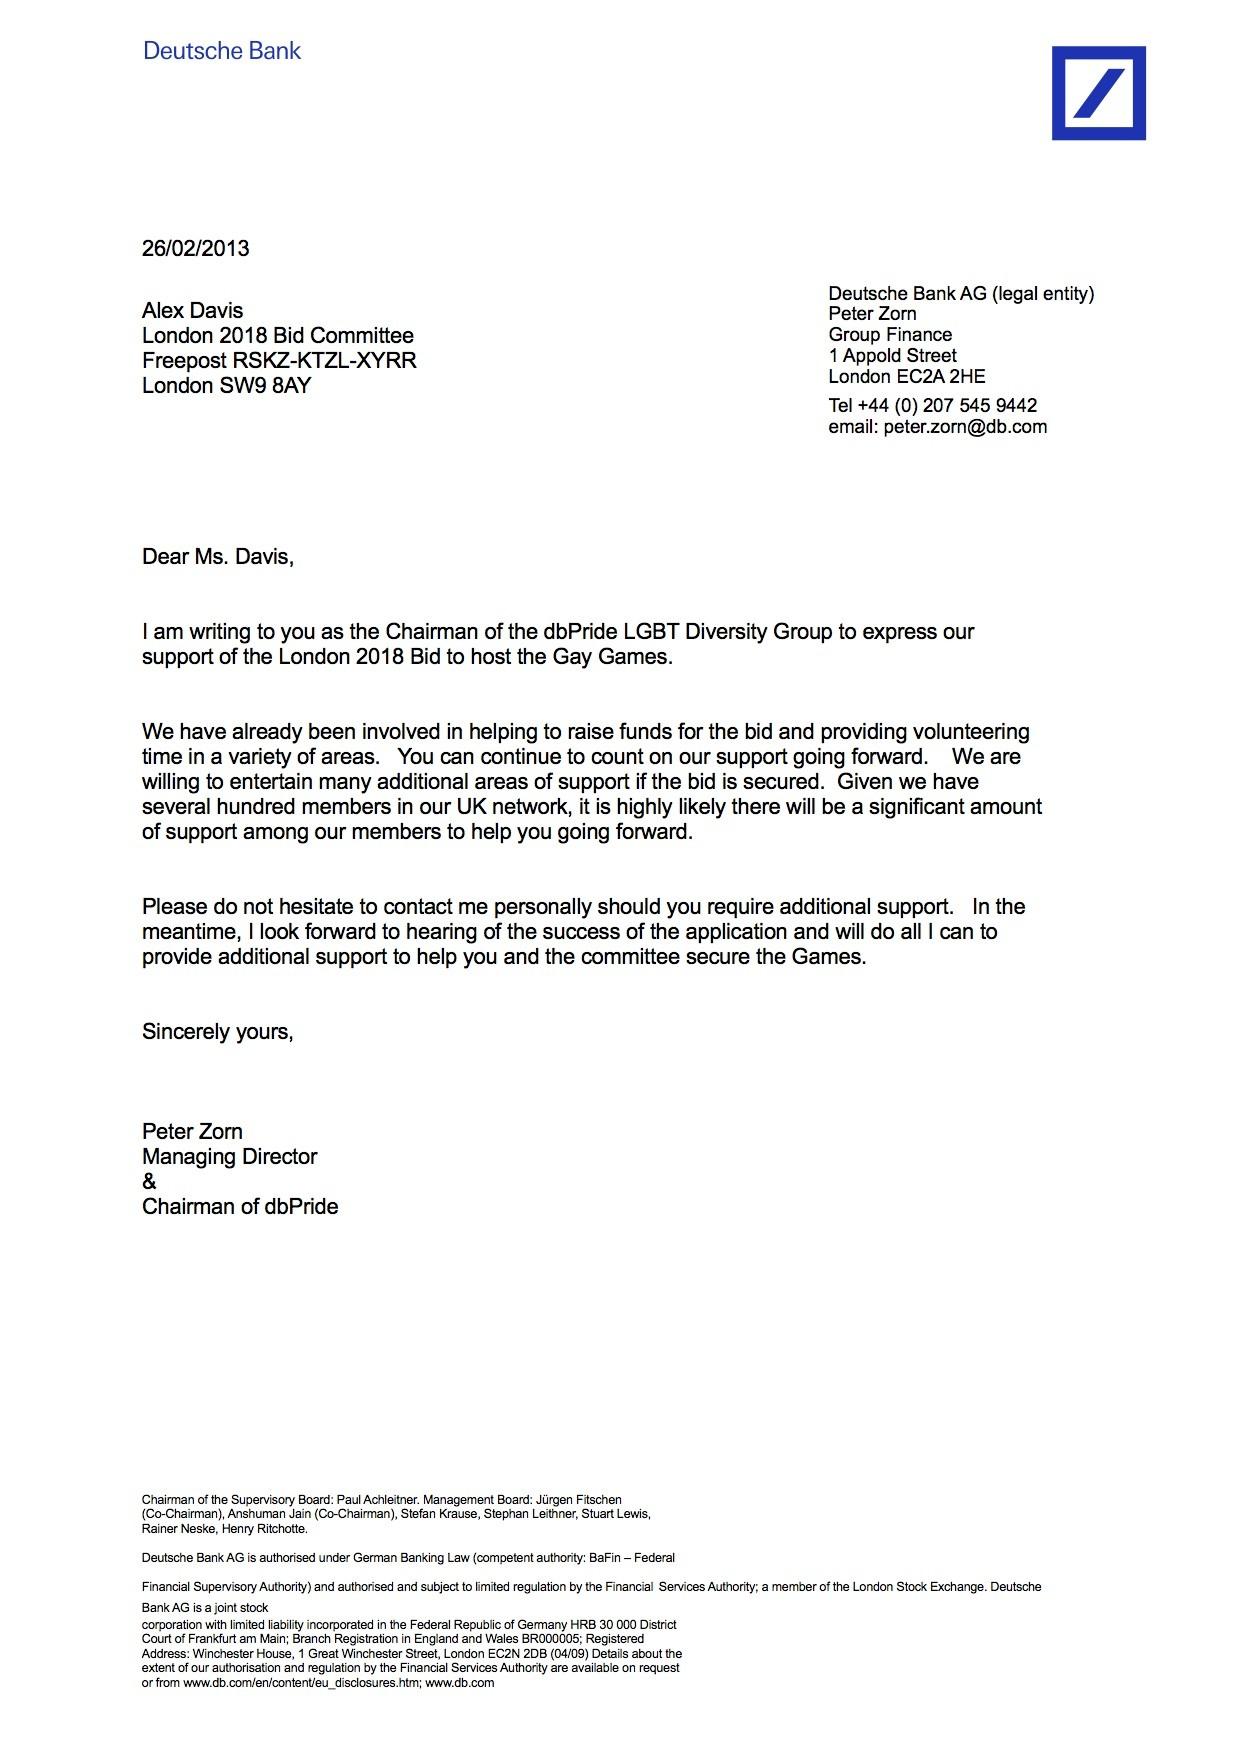 Deutsche Bank Letterhead Sample Google Search Letterhead Sample Letterhead Finance